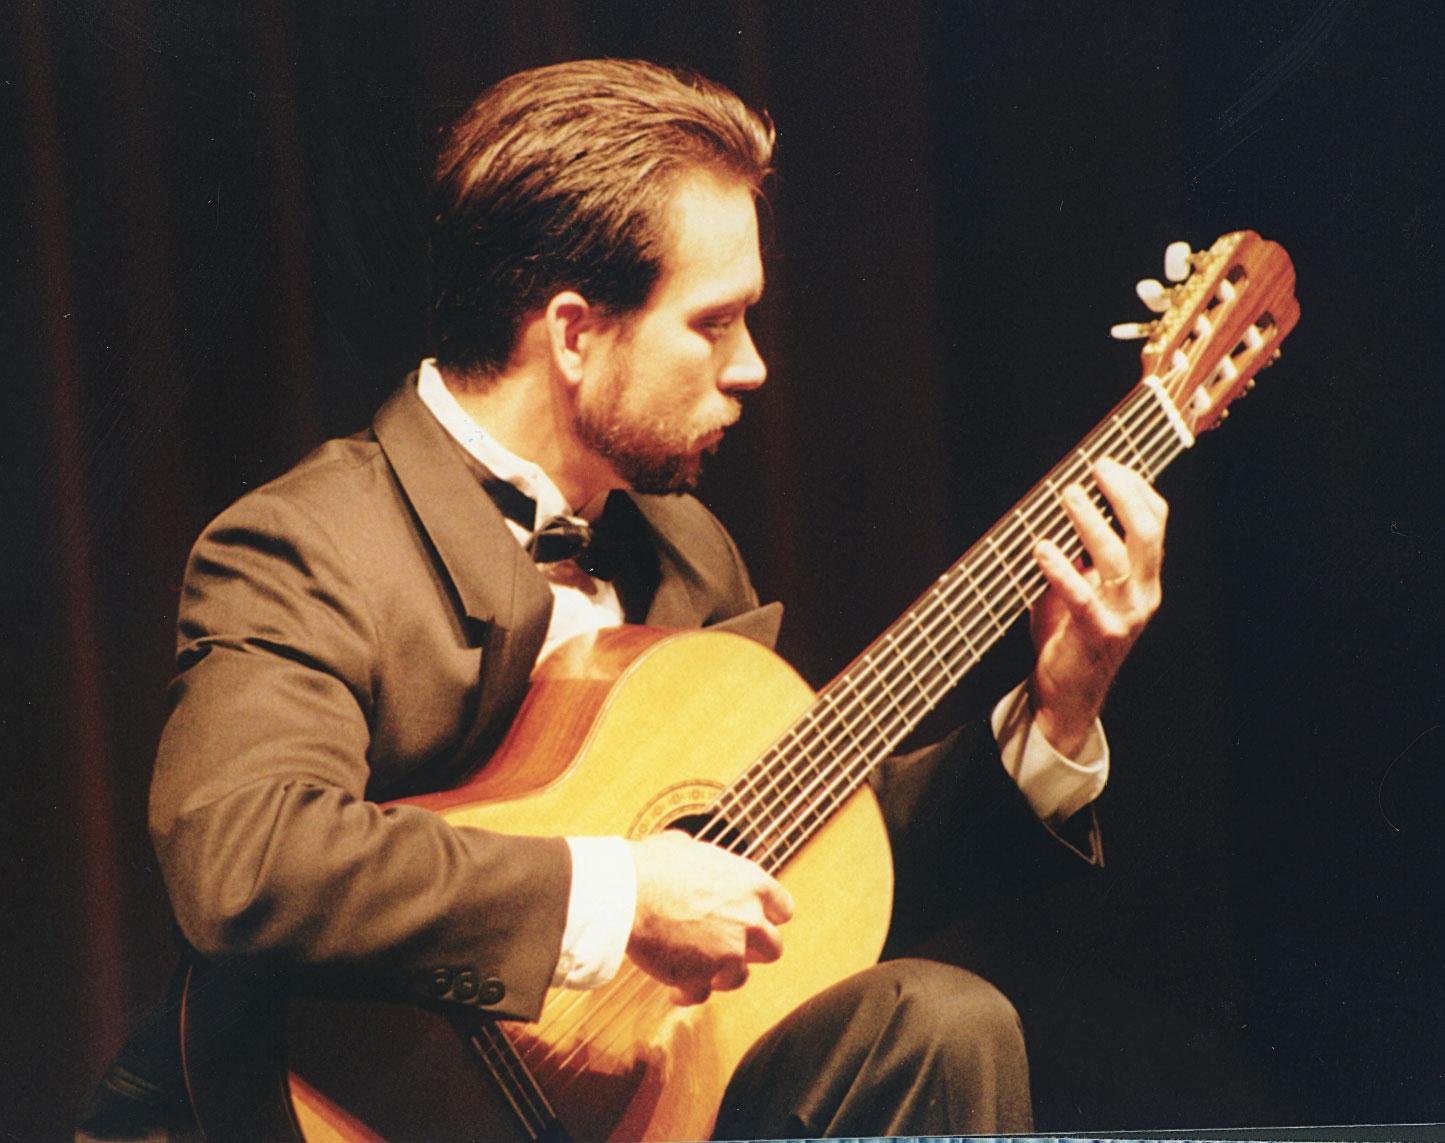 Performing at Huntington College.